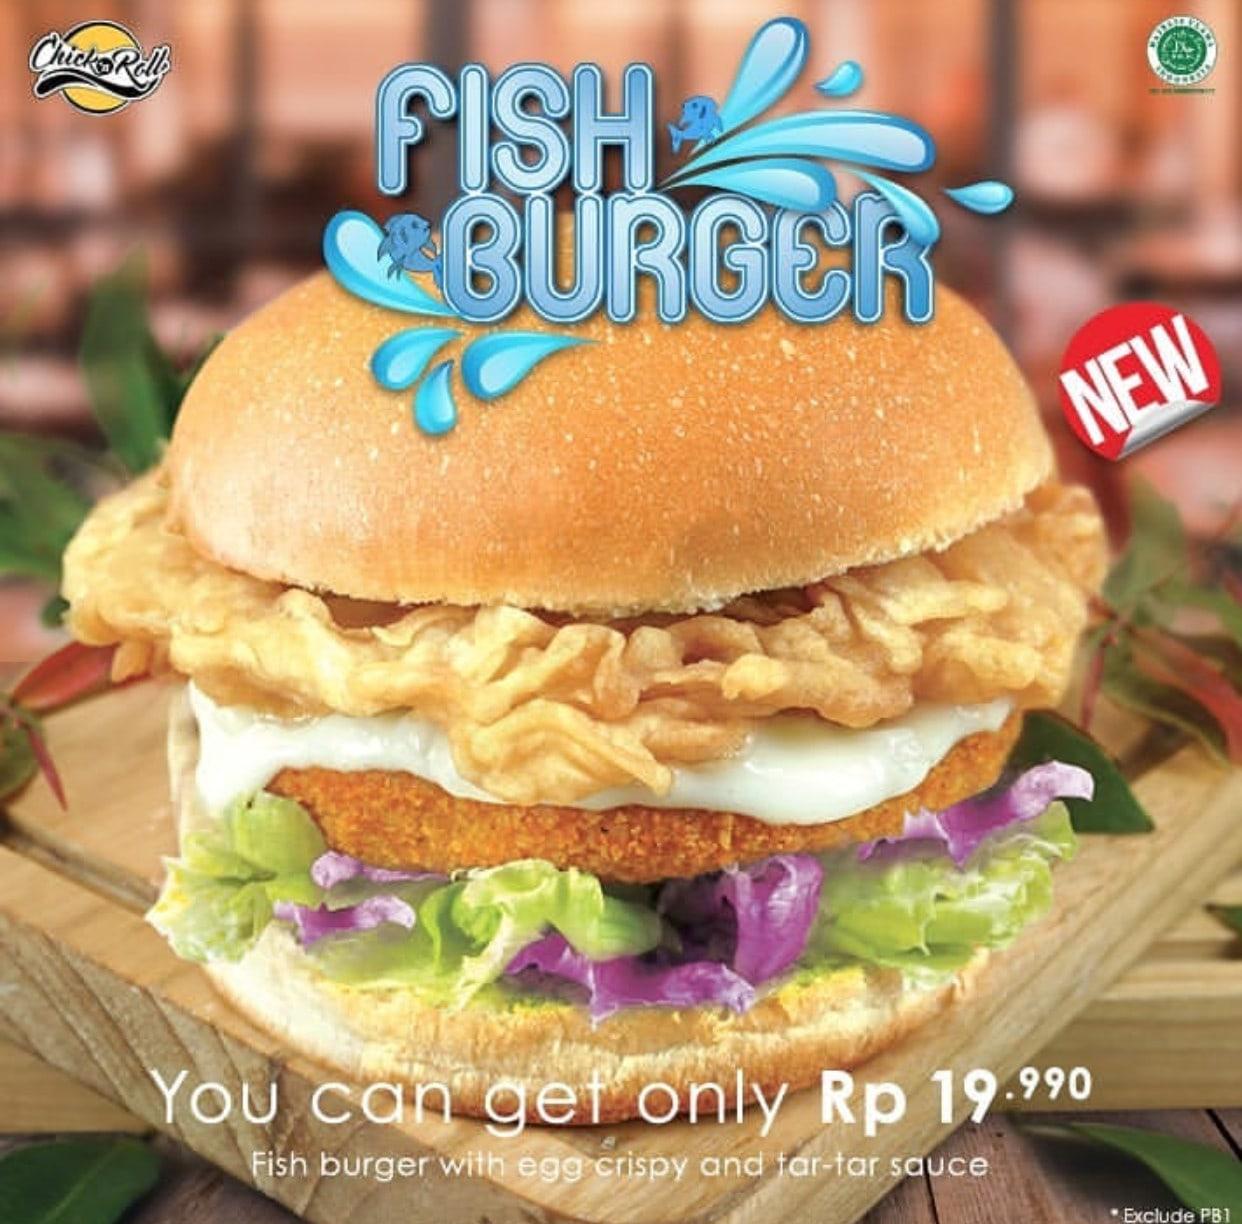 CHICK 'n ROLL New FISH BURGER Harga hanya Rp.19.990